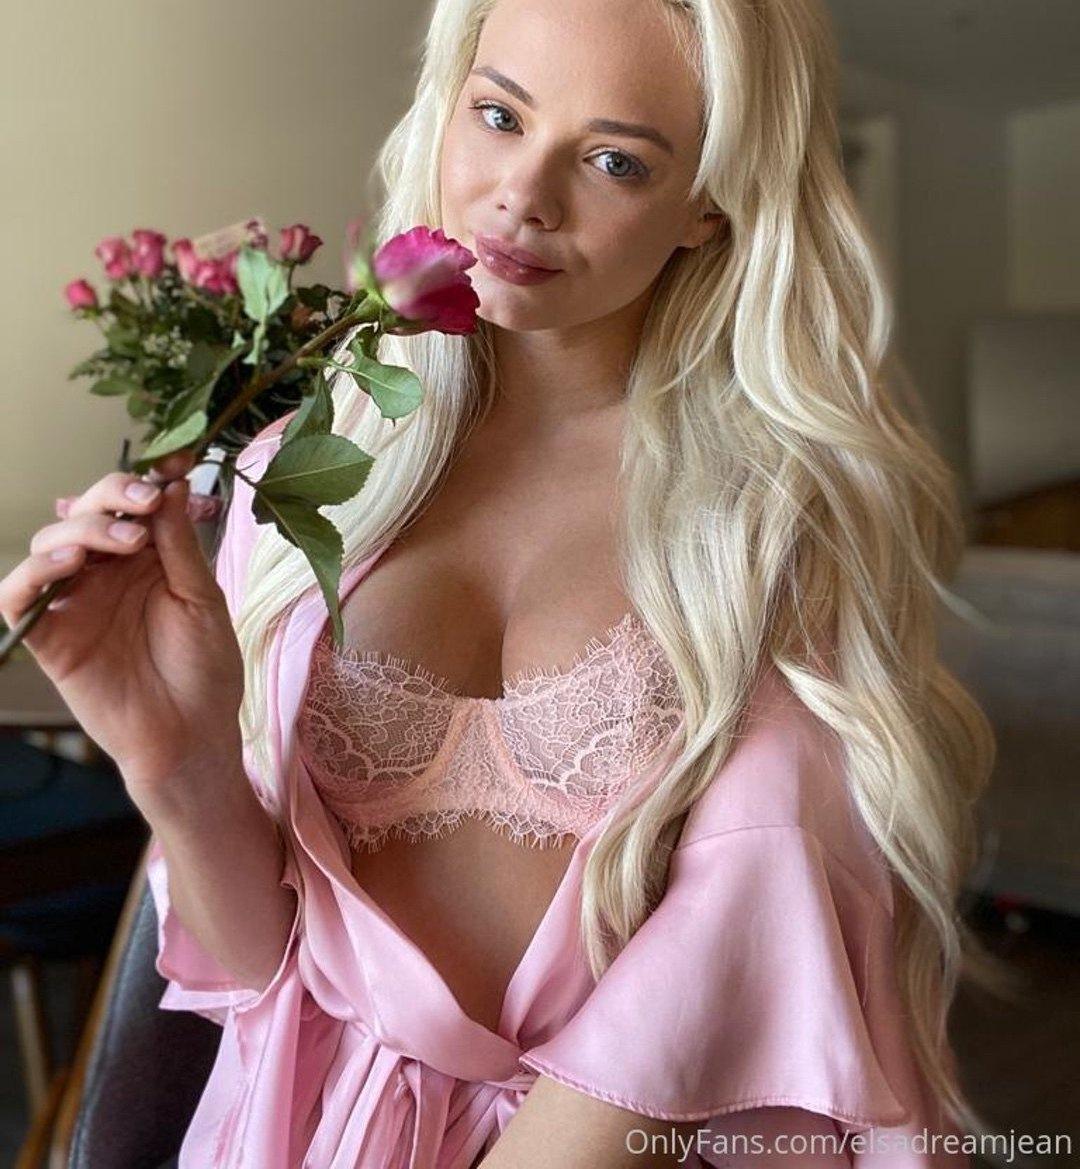 Elsa Jean Elsadreamjean Onlyfans Nudes Leaks 0026